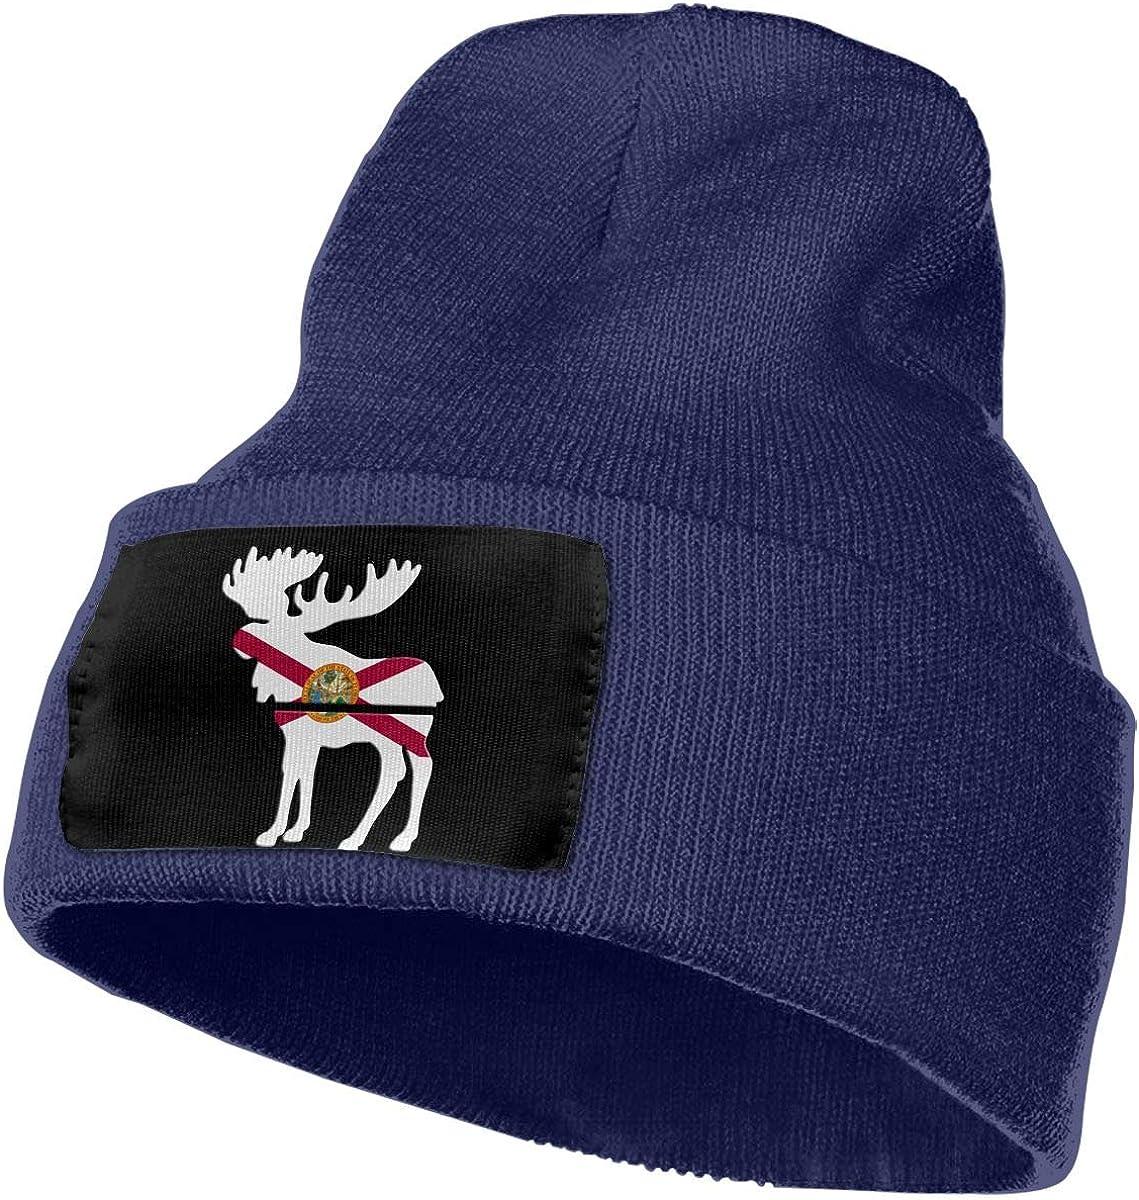 100/% Acrylic Skull Cap MXMAOM9MX Moose Florida Flag Warm Knitting Hat Mens Womens